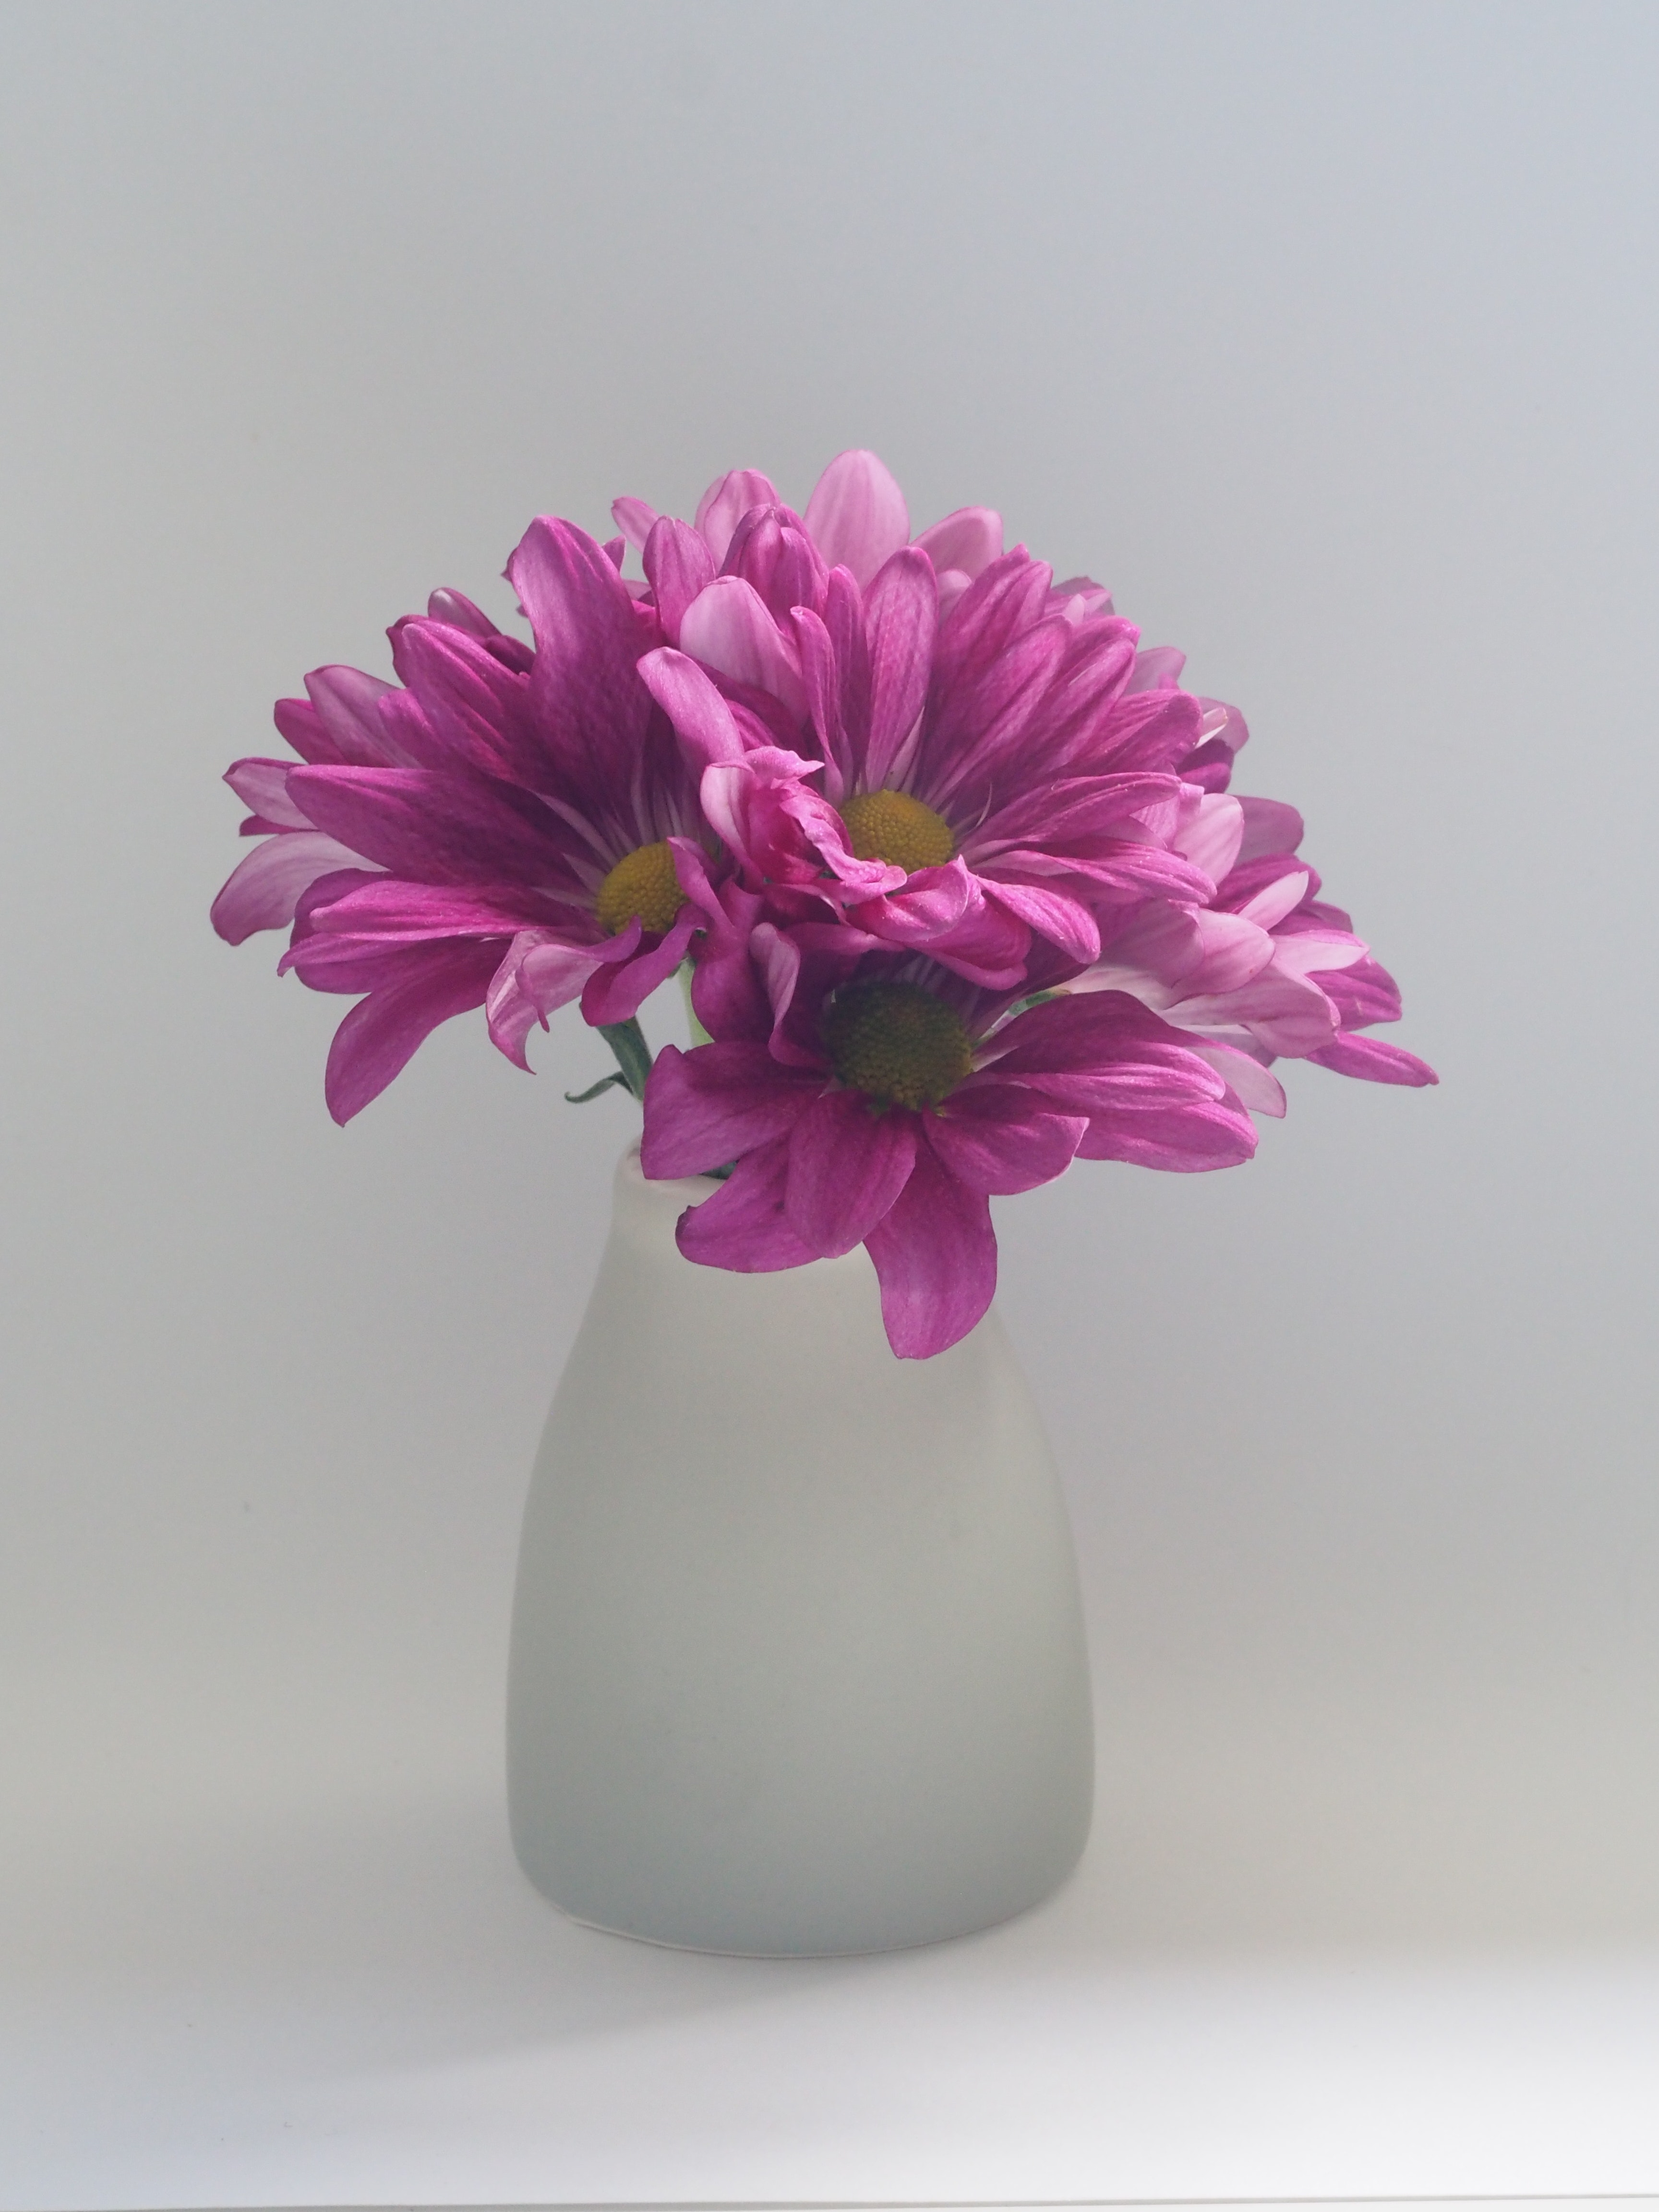 daisy-spring-flower-decor